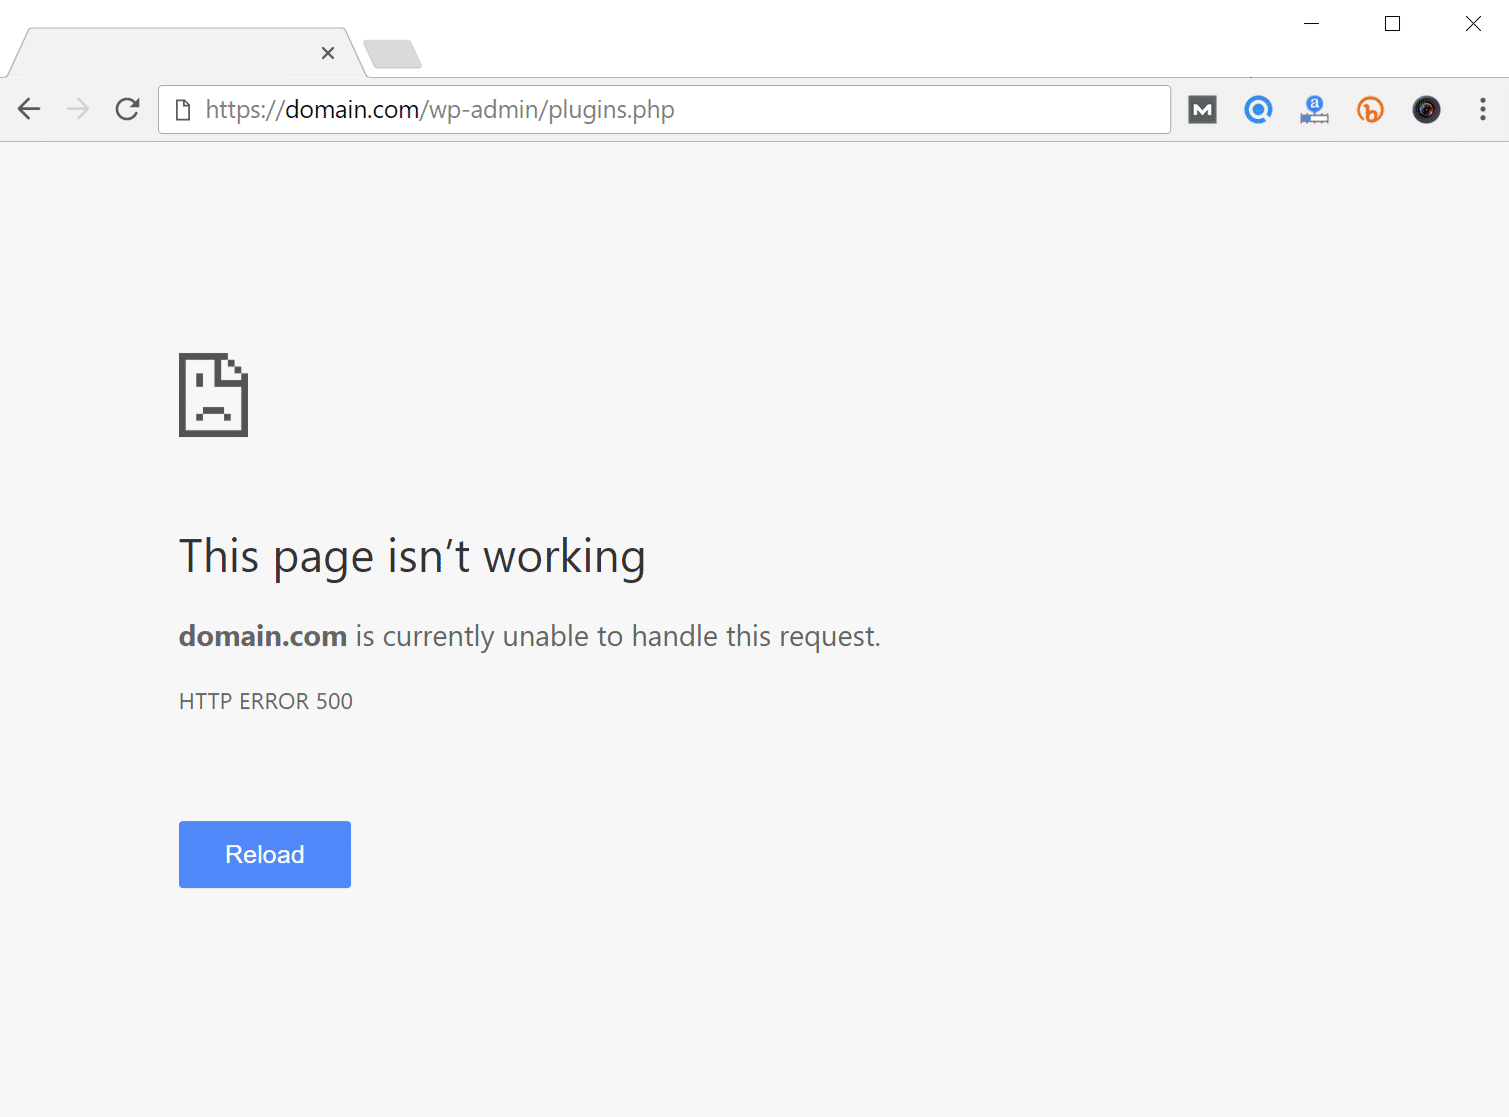 Errore 500 Internal server error in WordPress